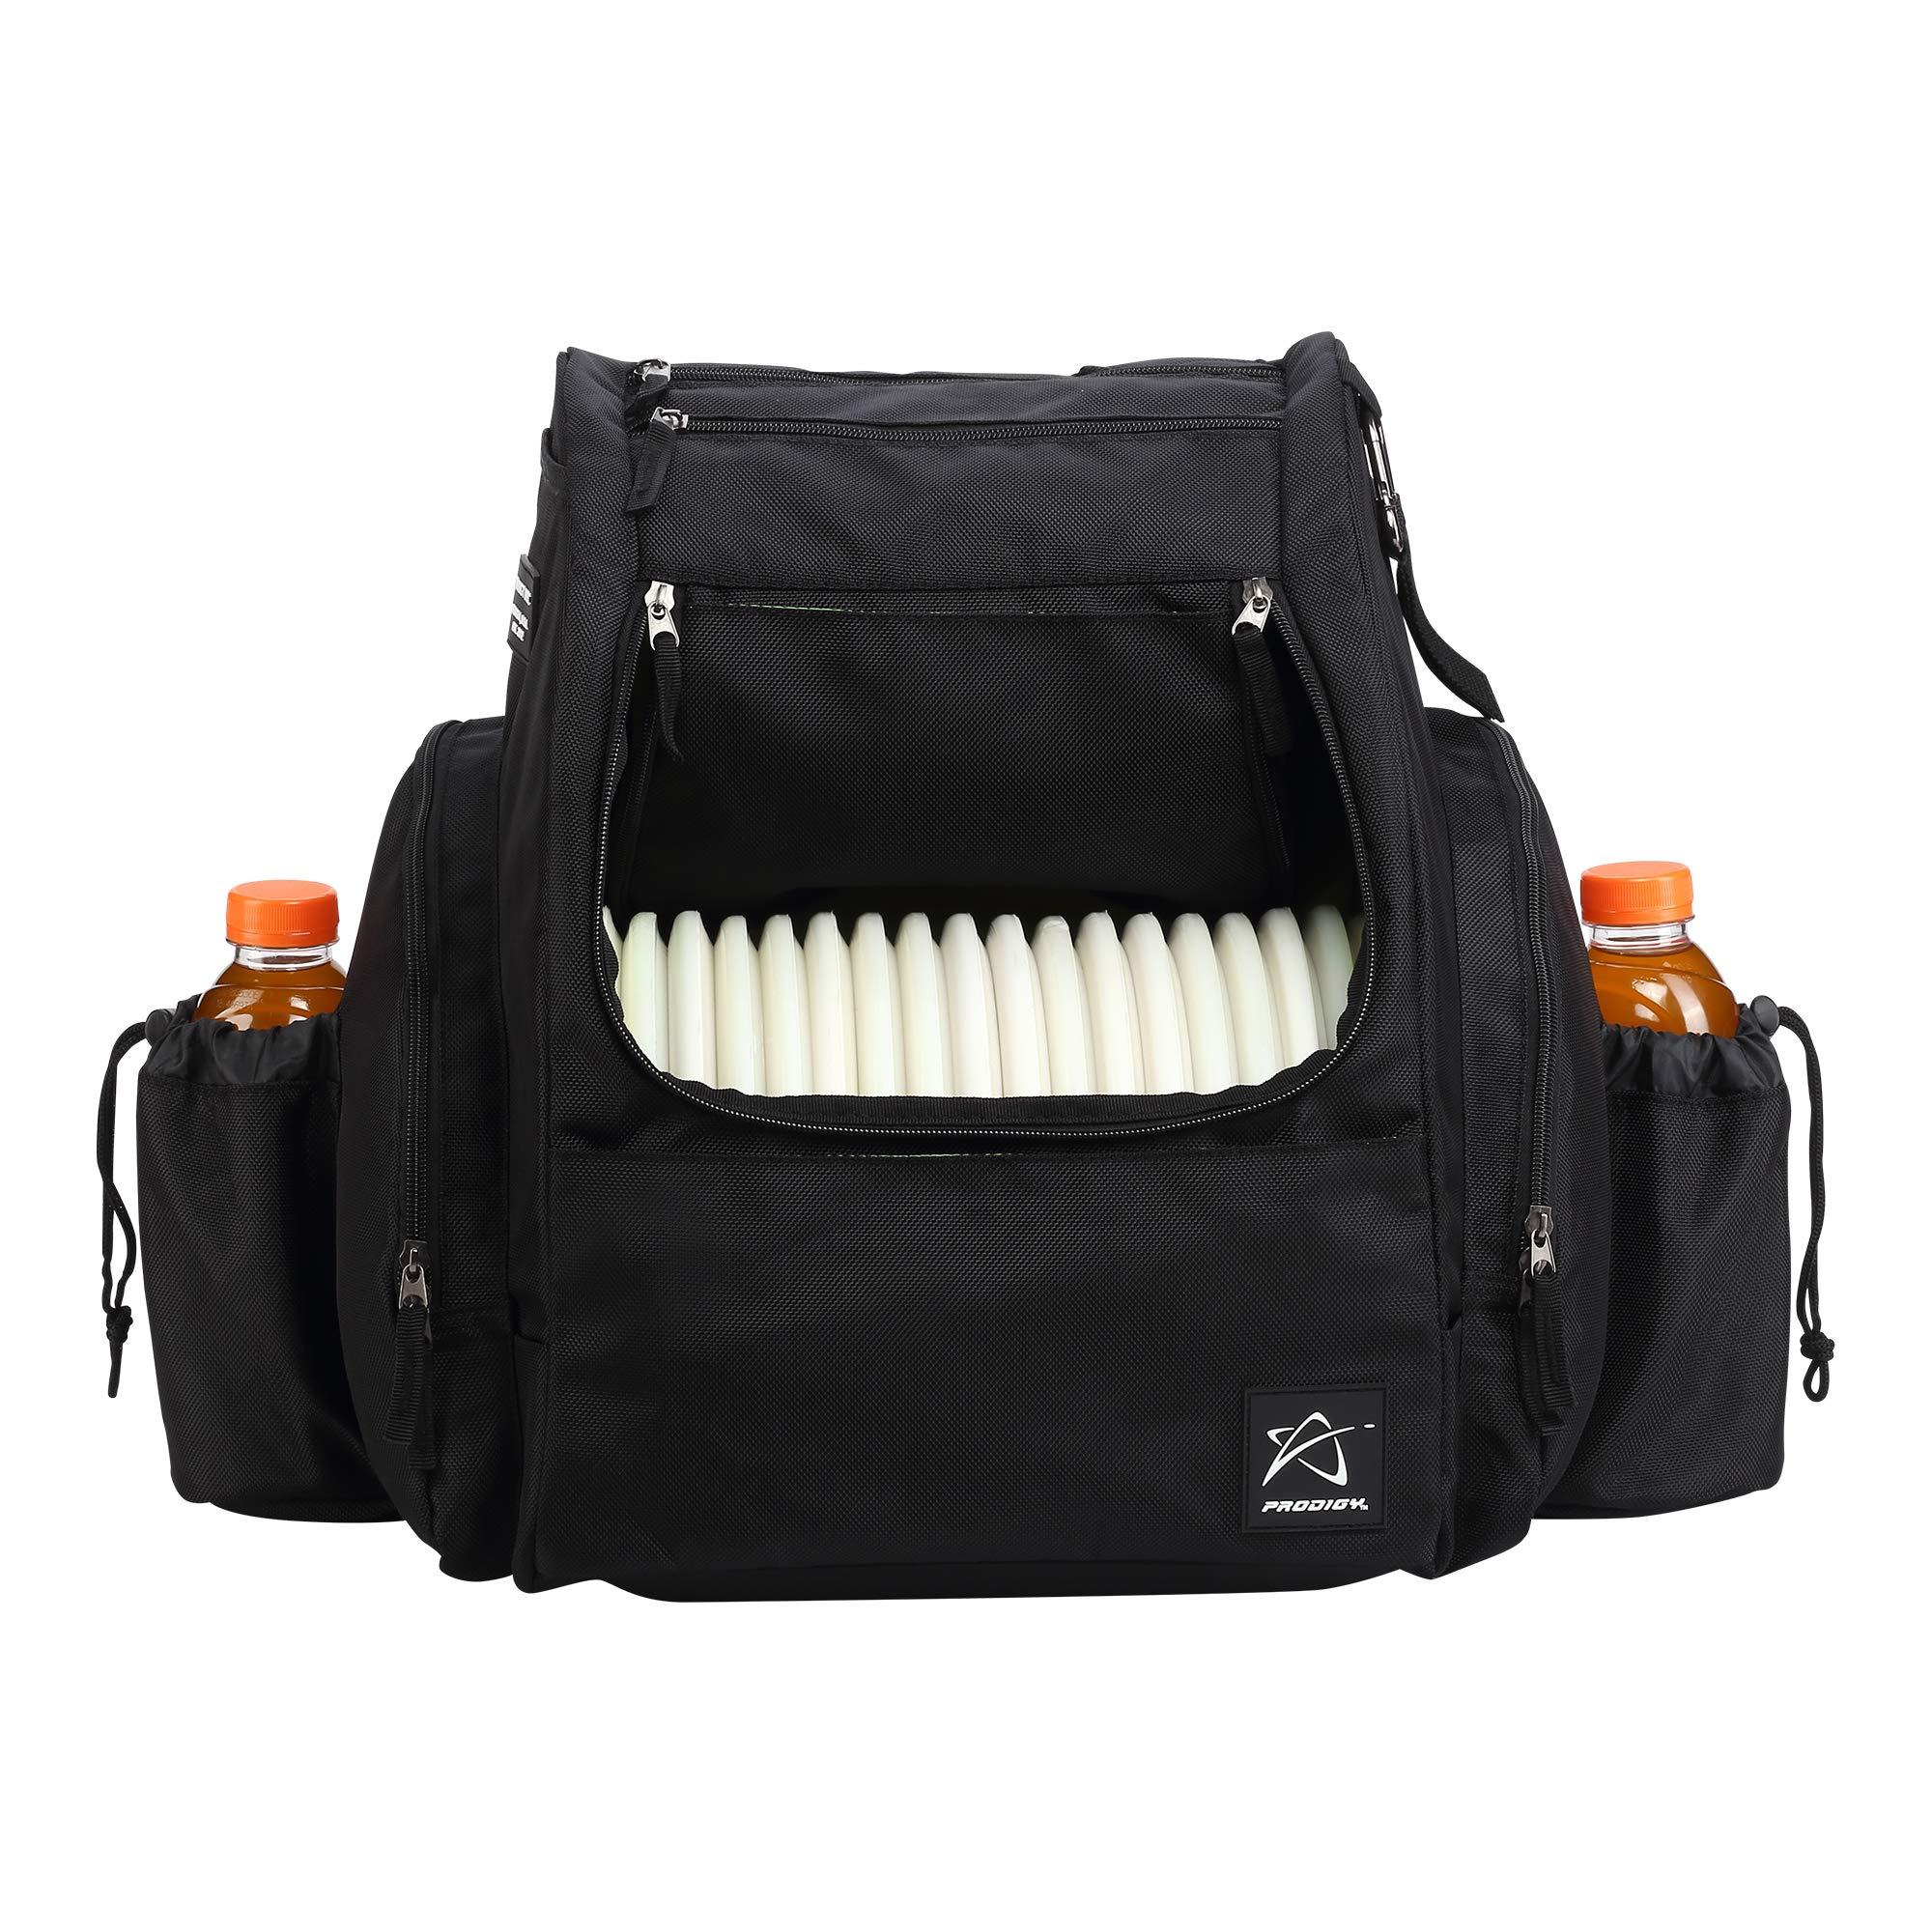 Prodigy Disc BP-2 Backpack - 2019 Model - Fits 25 Discs (Black/Volt, Rainfly)